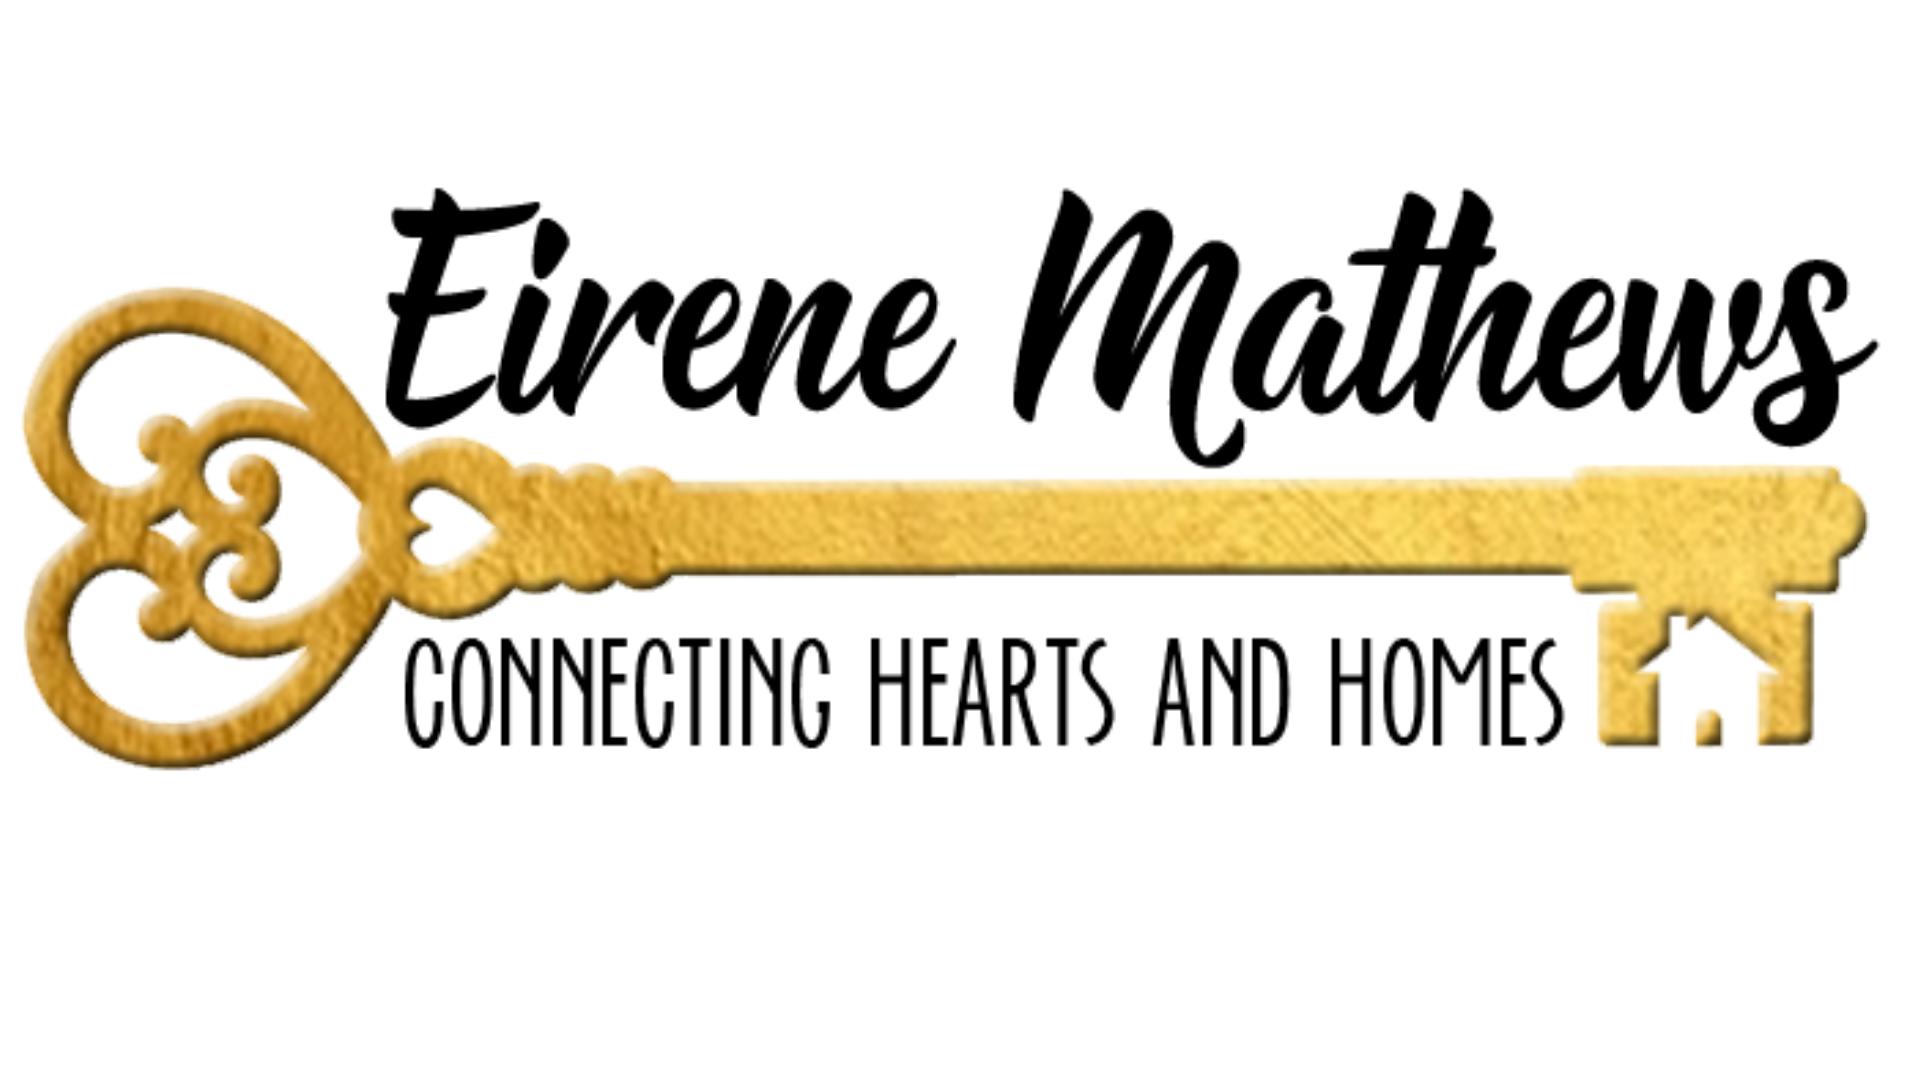 Eirene Mathews logo